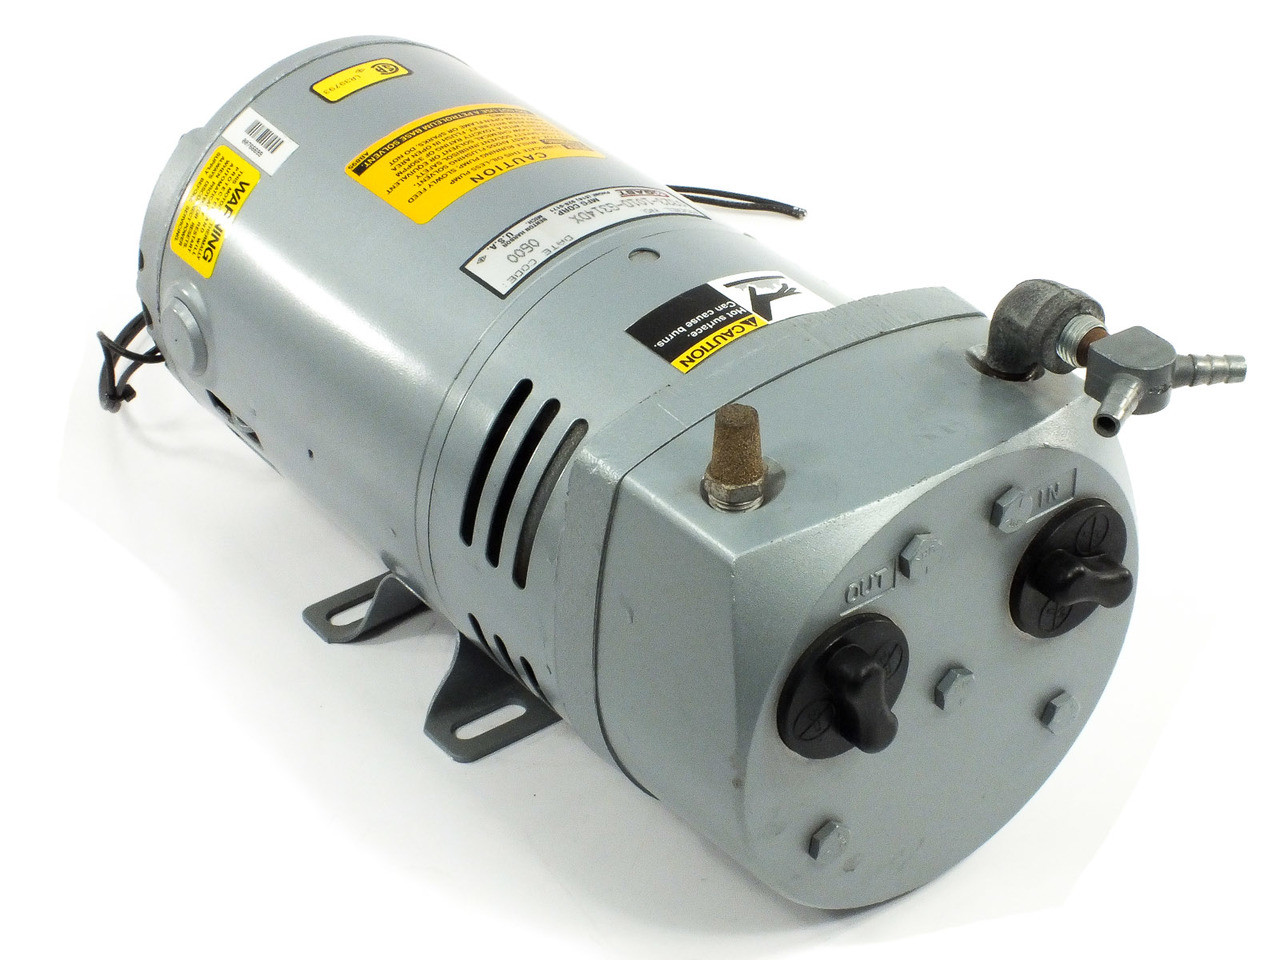 Gast 0323-1010-G314DX Oilless Vacuum Pump 230 Volt AC 2 4 Amp w/ 1/4 HP  Motor